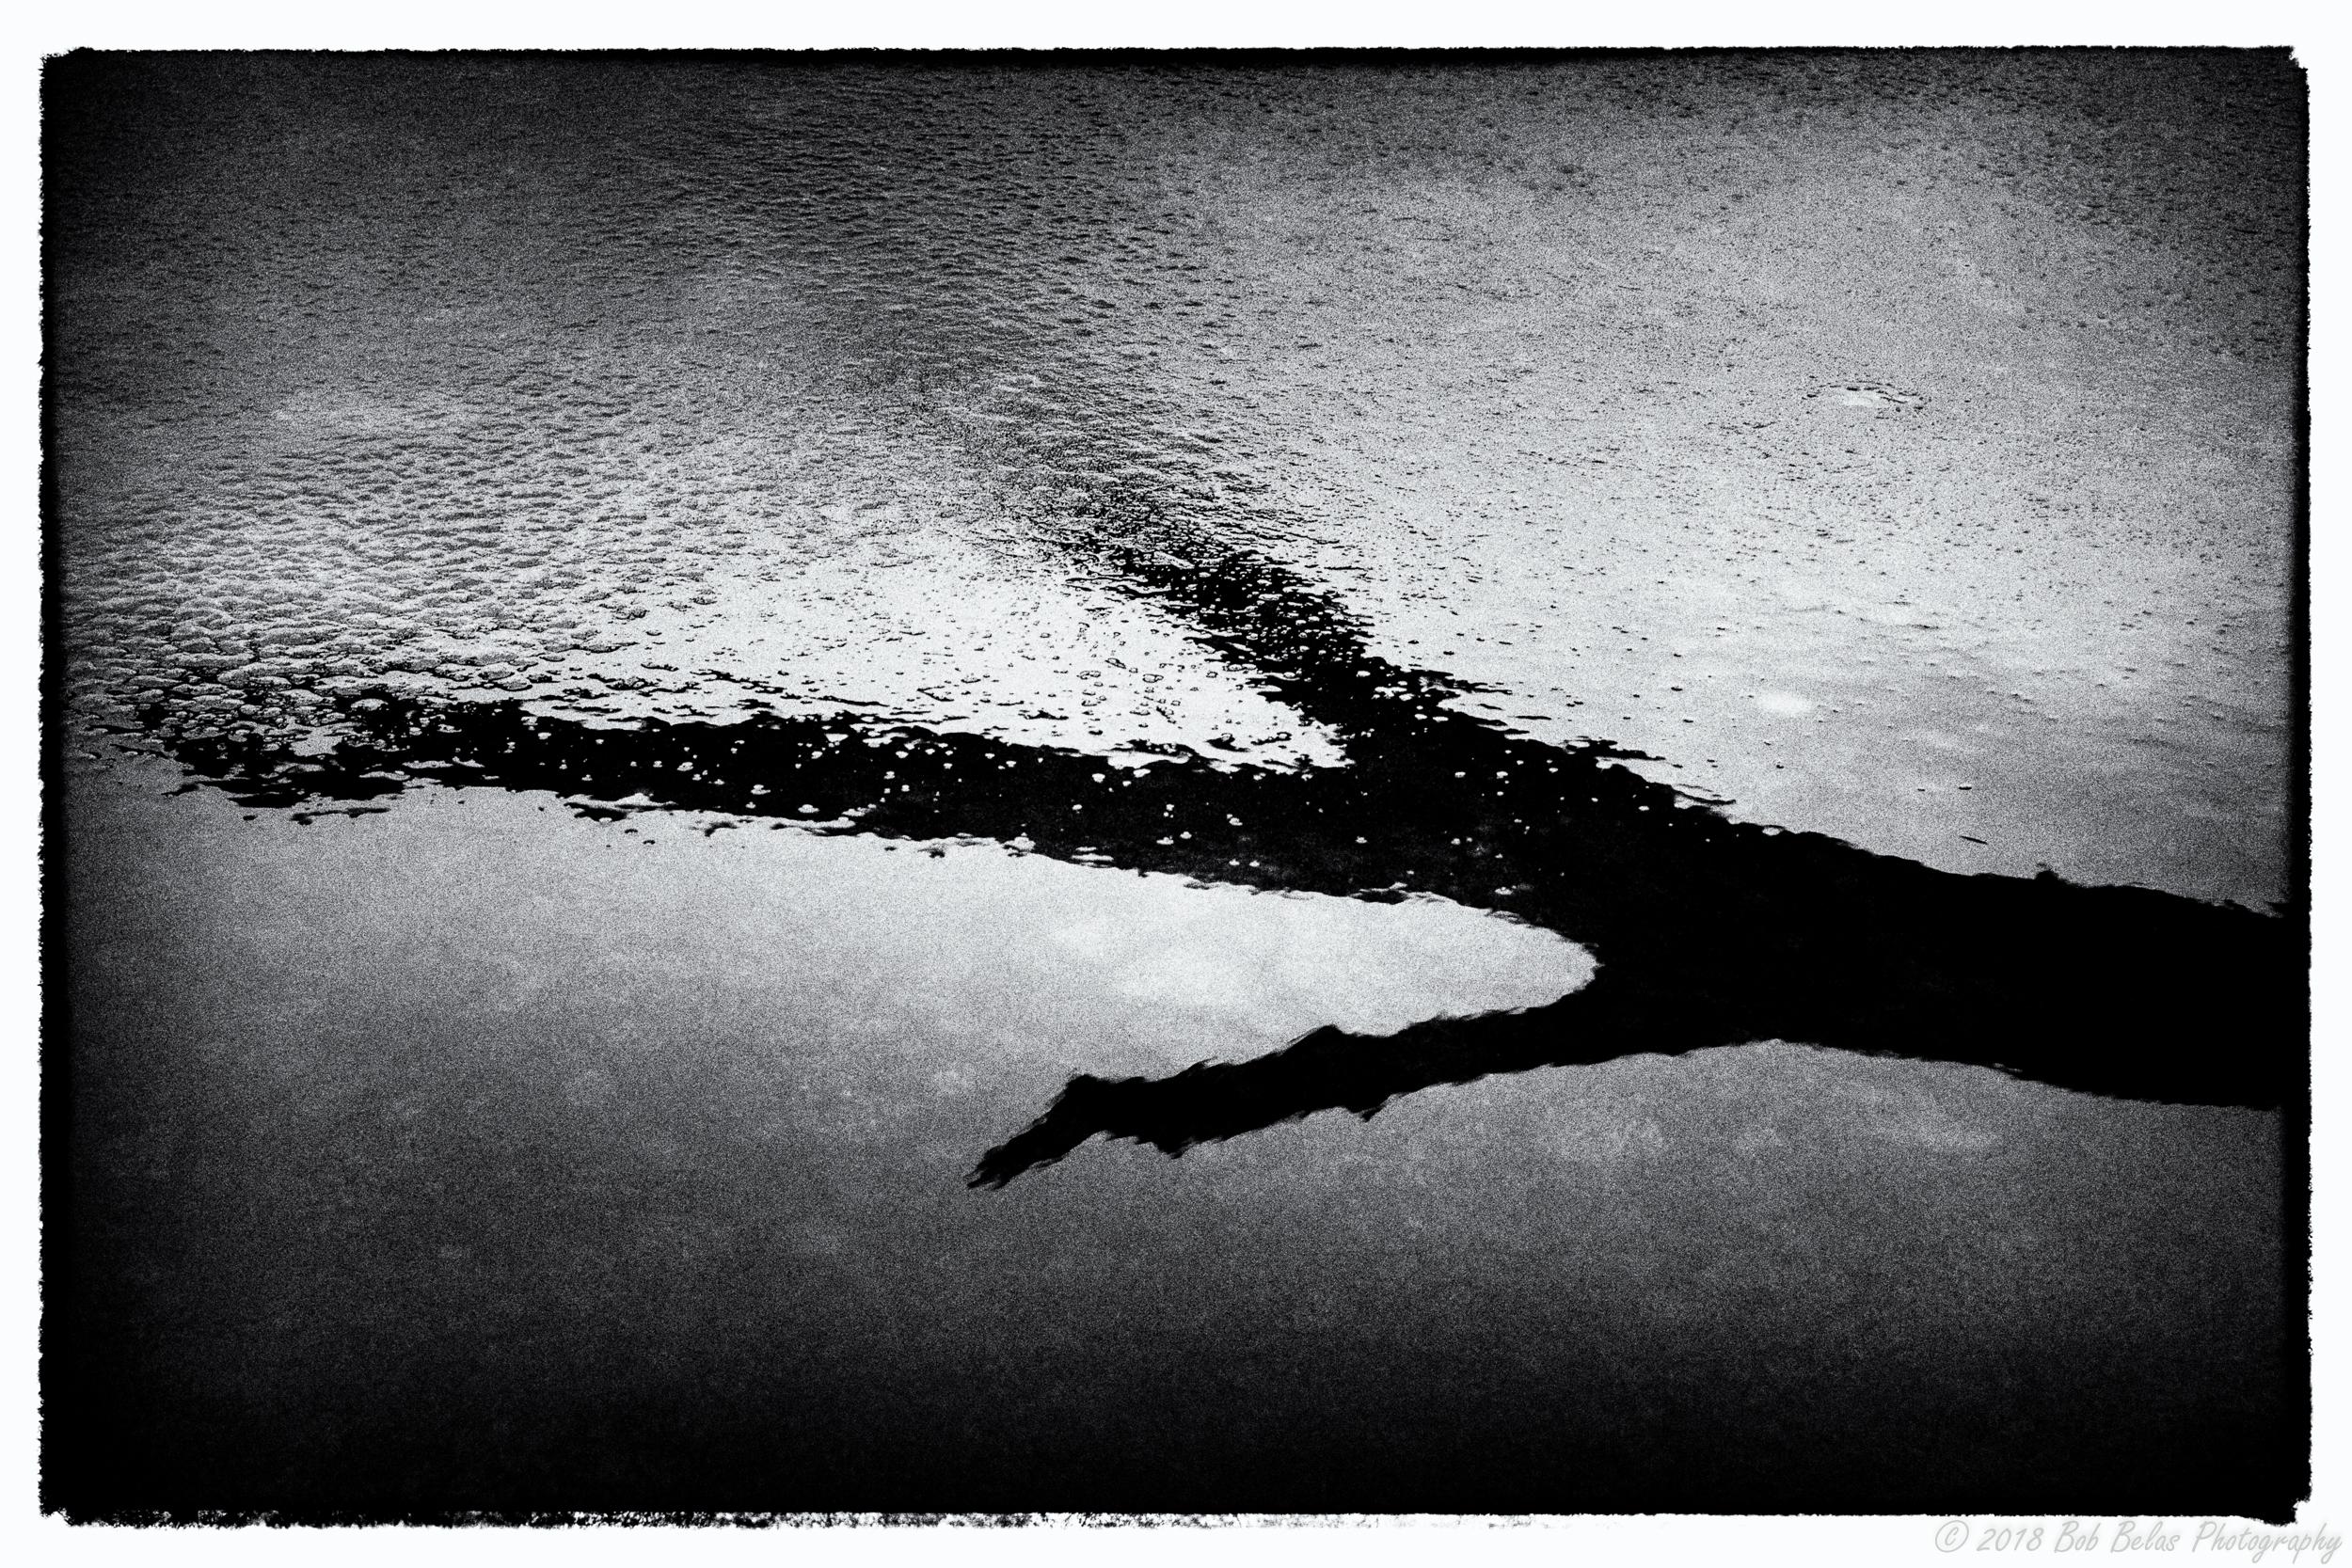 Ice Dream #4, monochrome